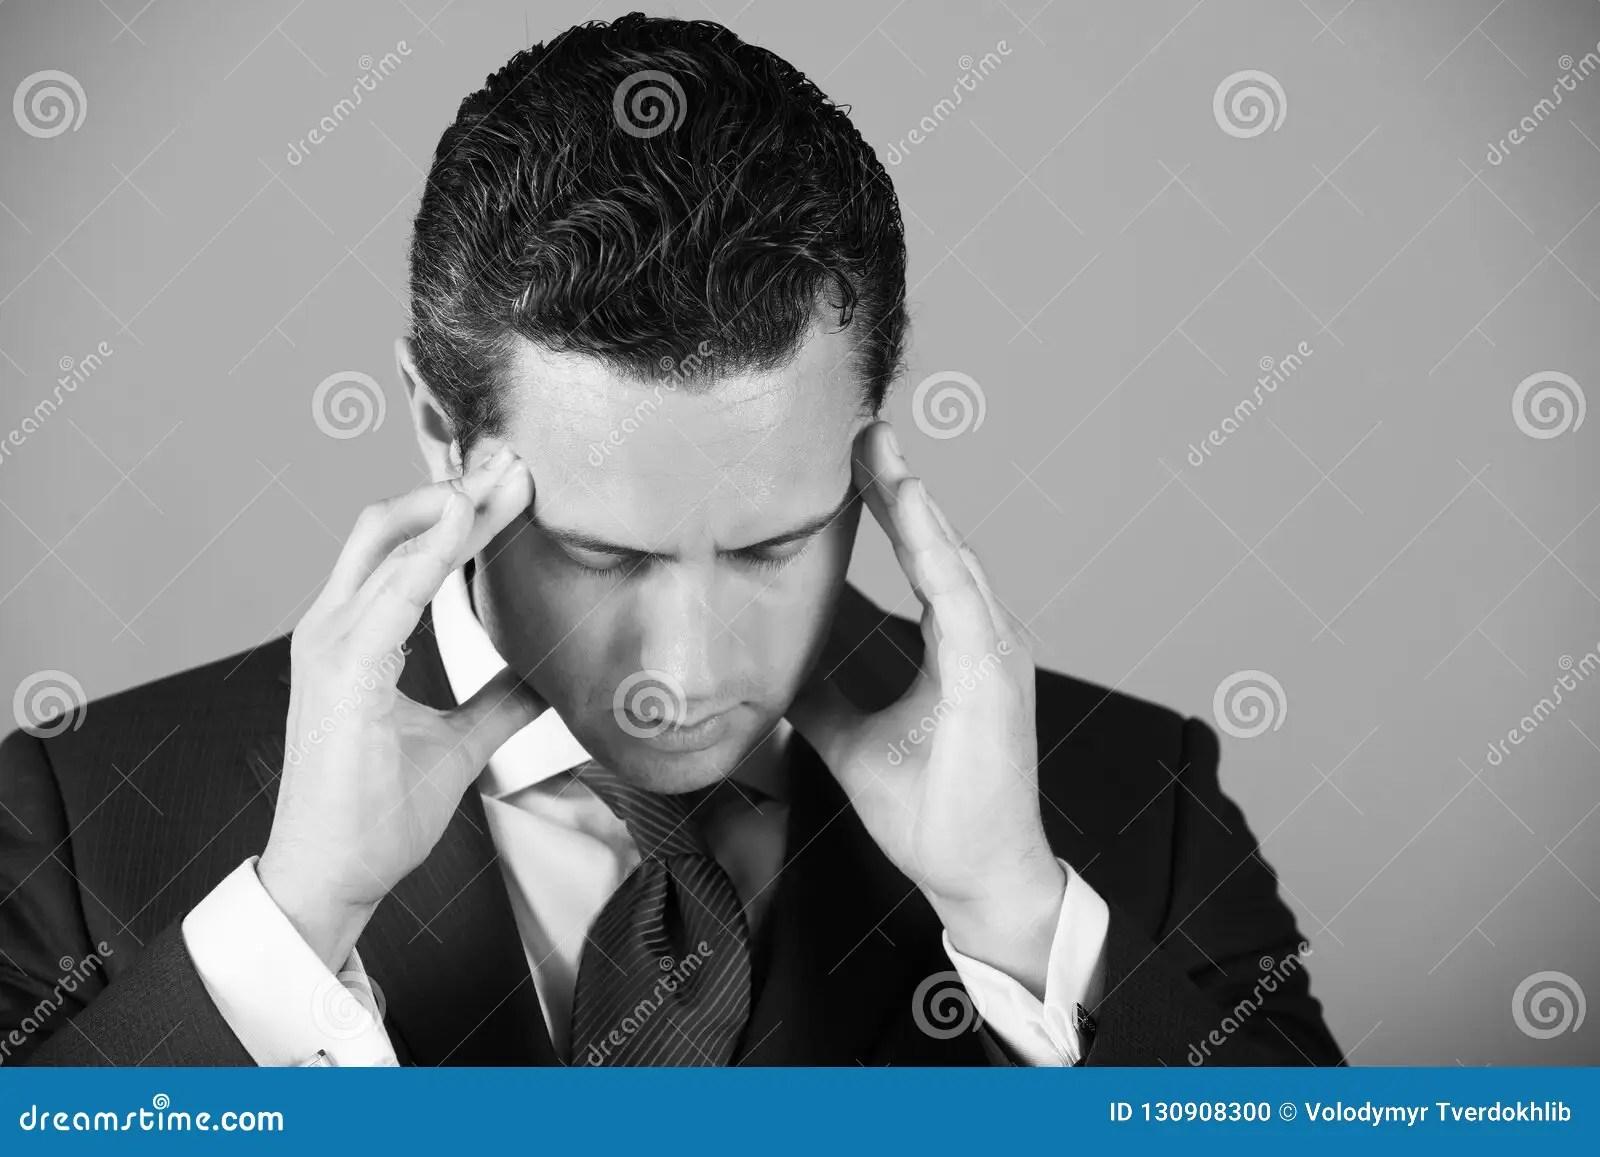 man feeling headache with